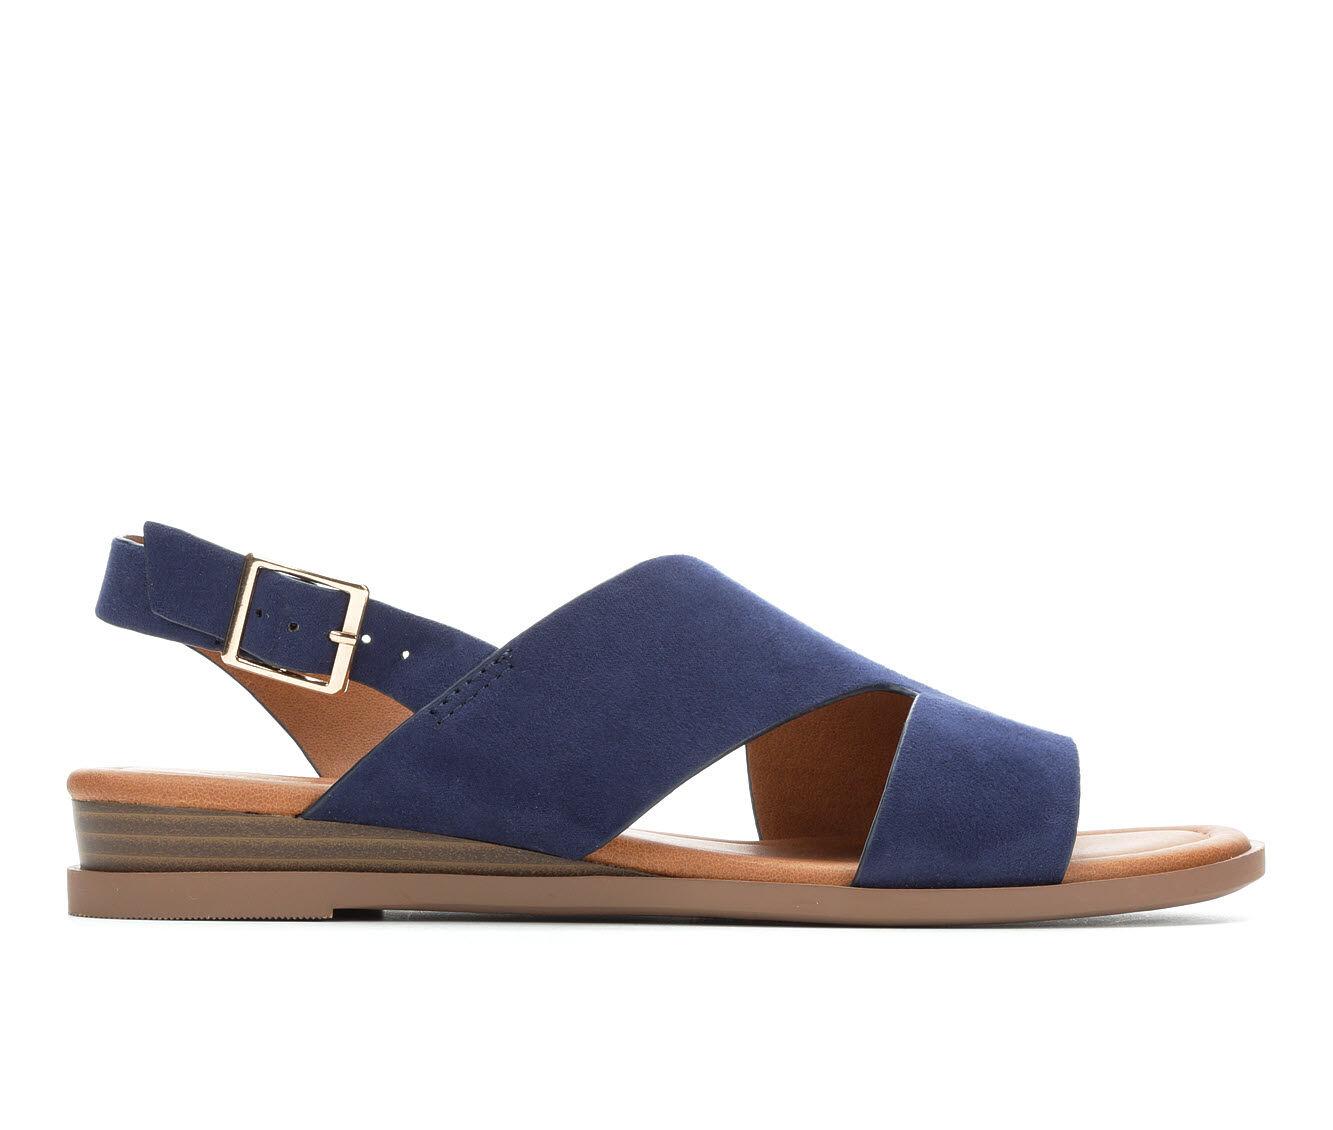 For Sale Popular Women's Solanz Brooklyn Sandals Navy Df